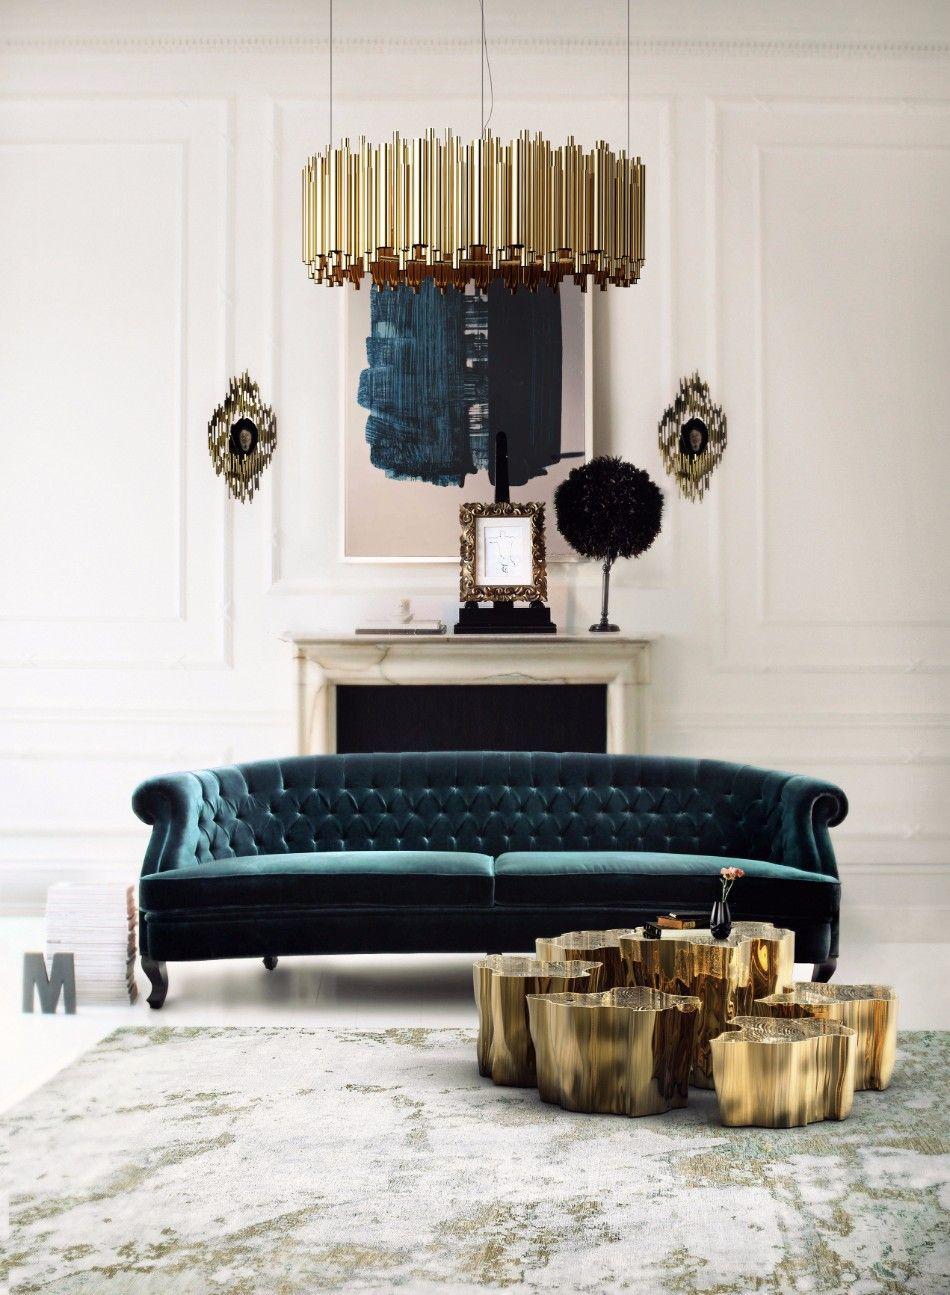 Contemporary hallway ideas  Contemporary Hallway Ideas to Enliven Your Home Decor  Furniture